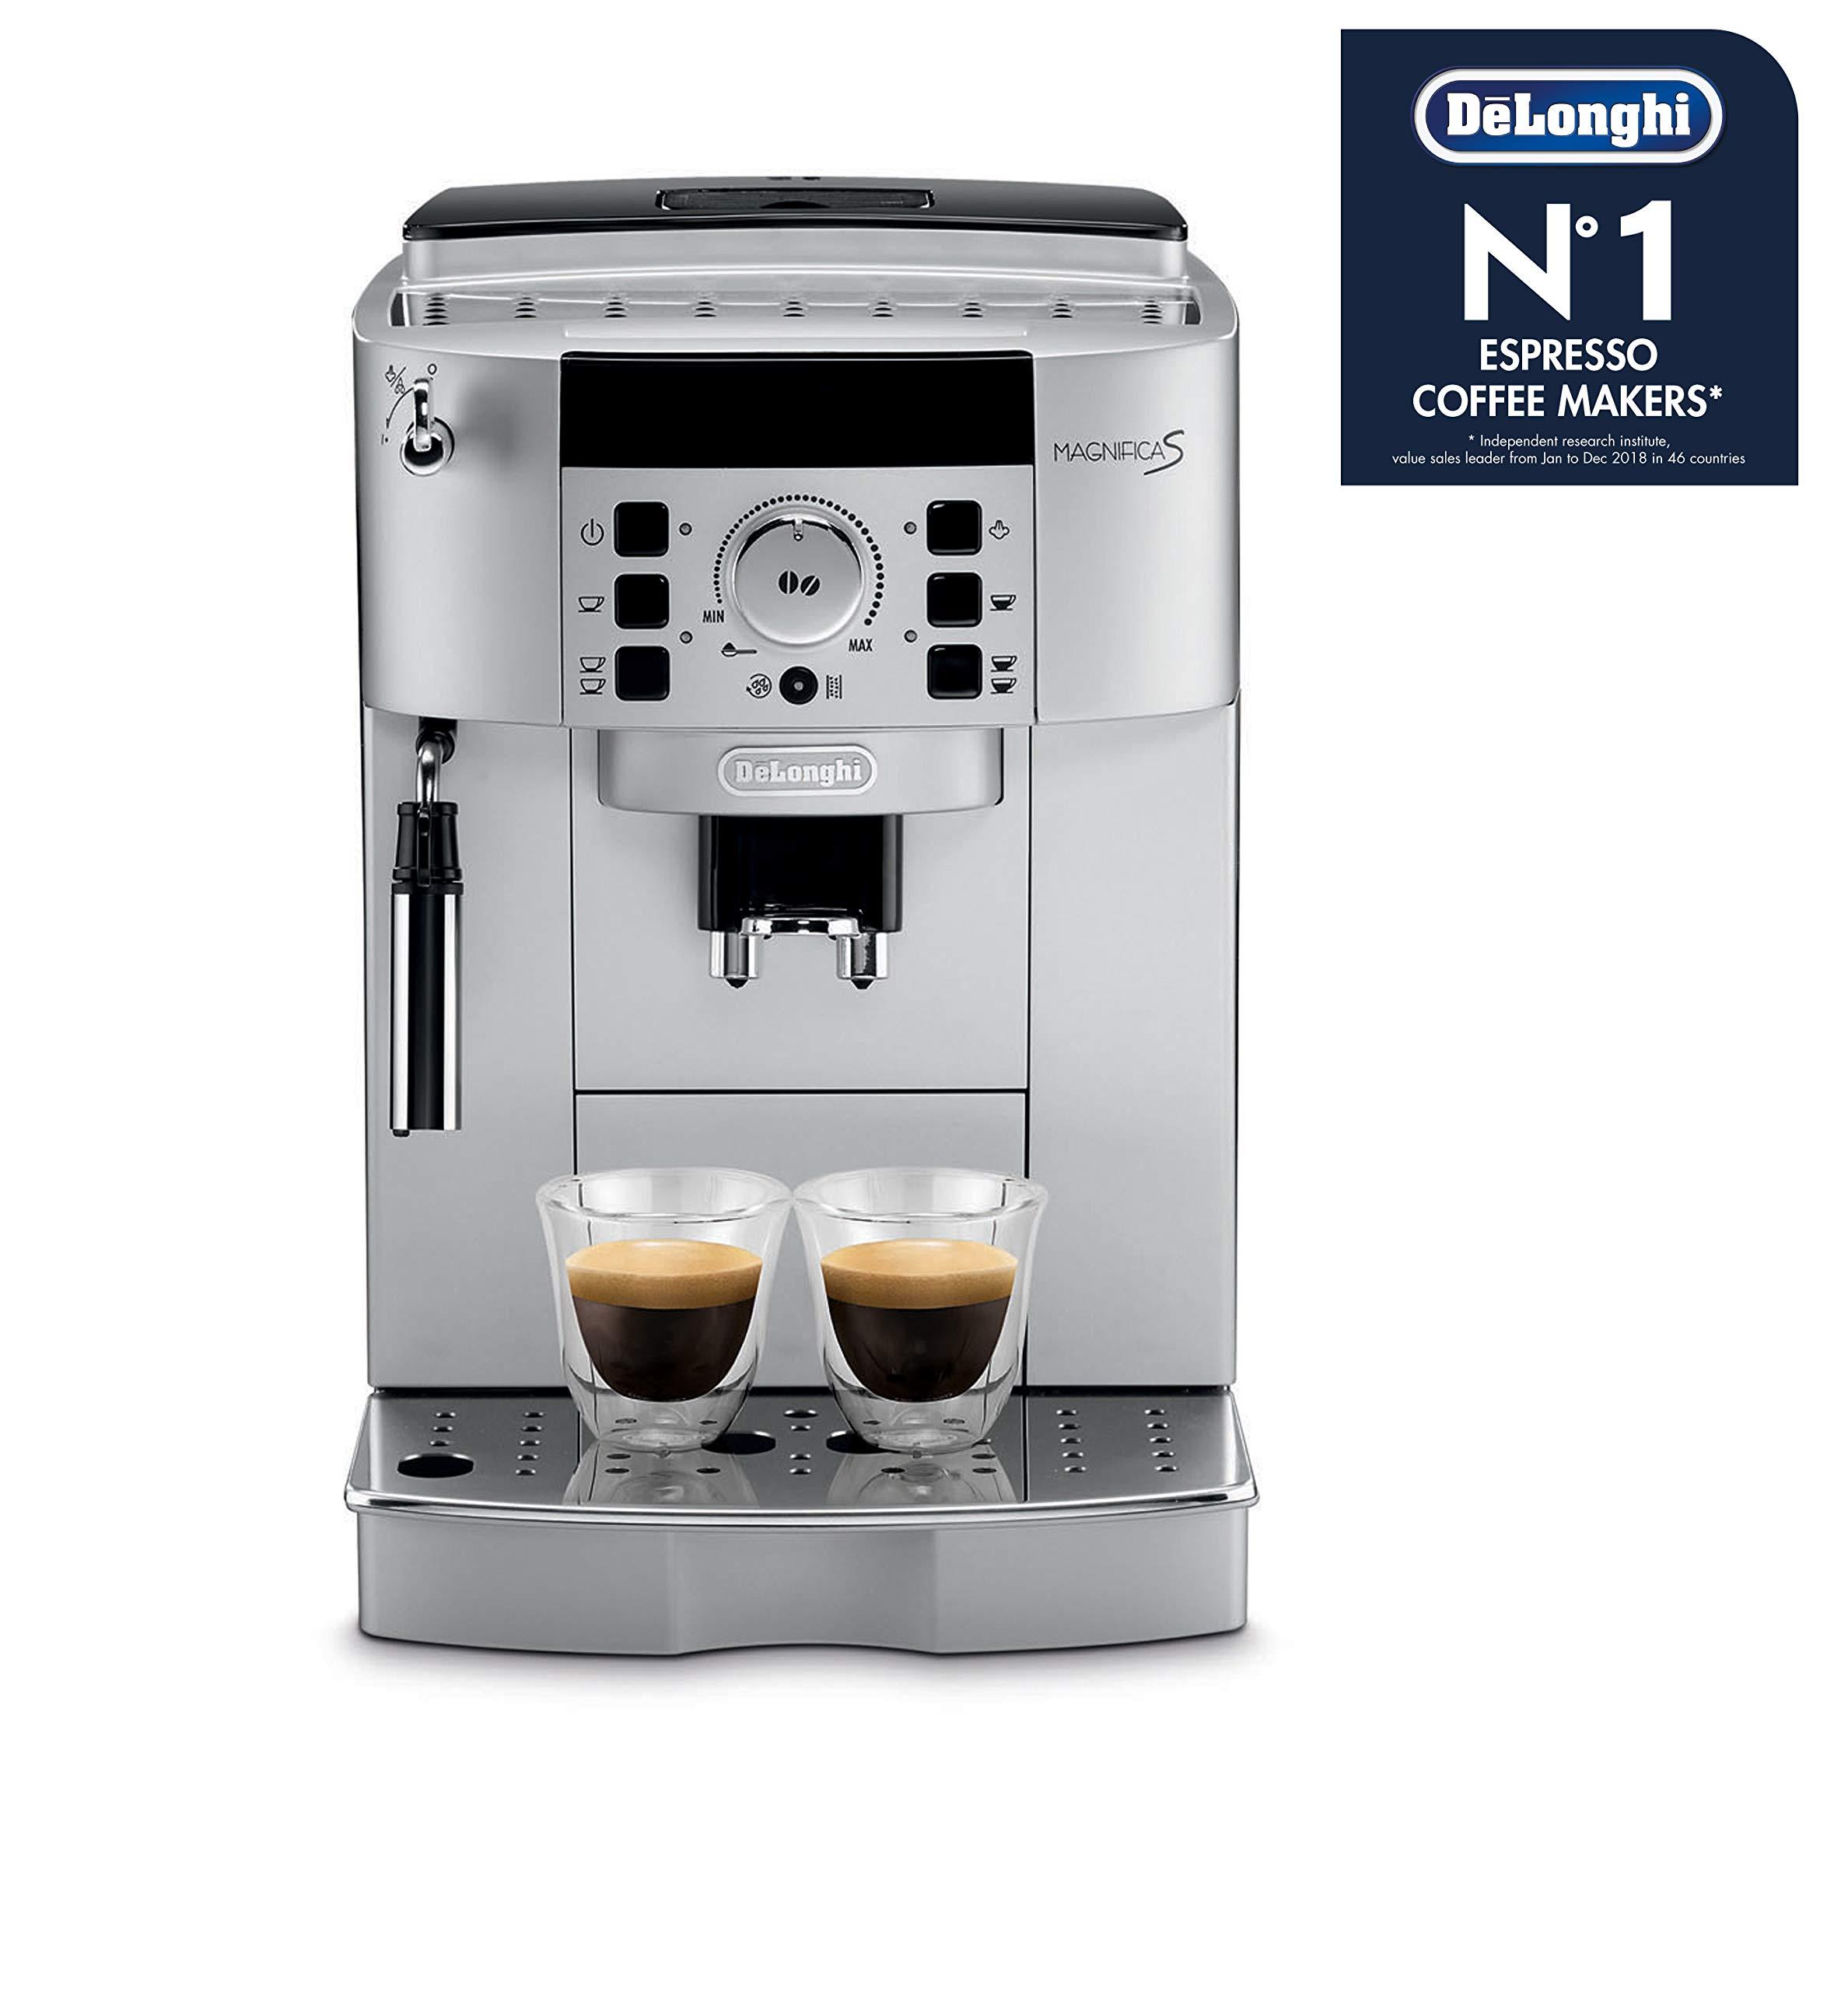 DeLonghi-Perfecta-ESAM-5500S-Kaffeevollautomat-18-l-Digitaldisplay-Integriertes-Milchsystem-Kegelmahlwerk-13-stufiges-Mahlwerk-Herausnehmbare-Brhgruppe-2-Tassen-Funktion